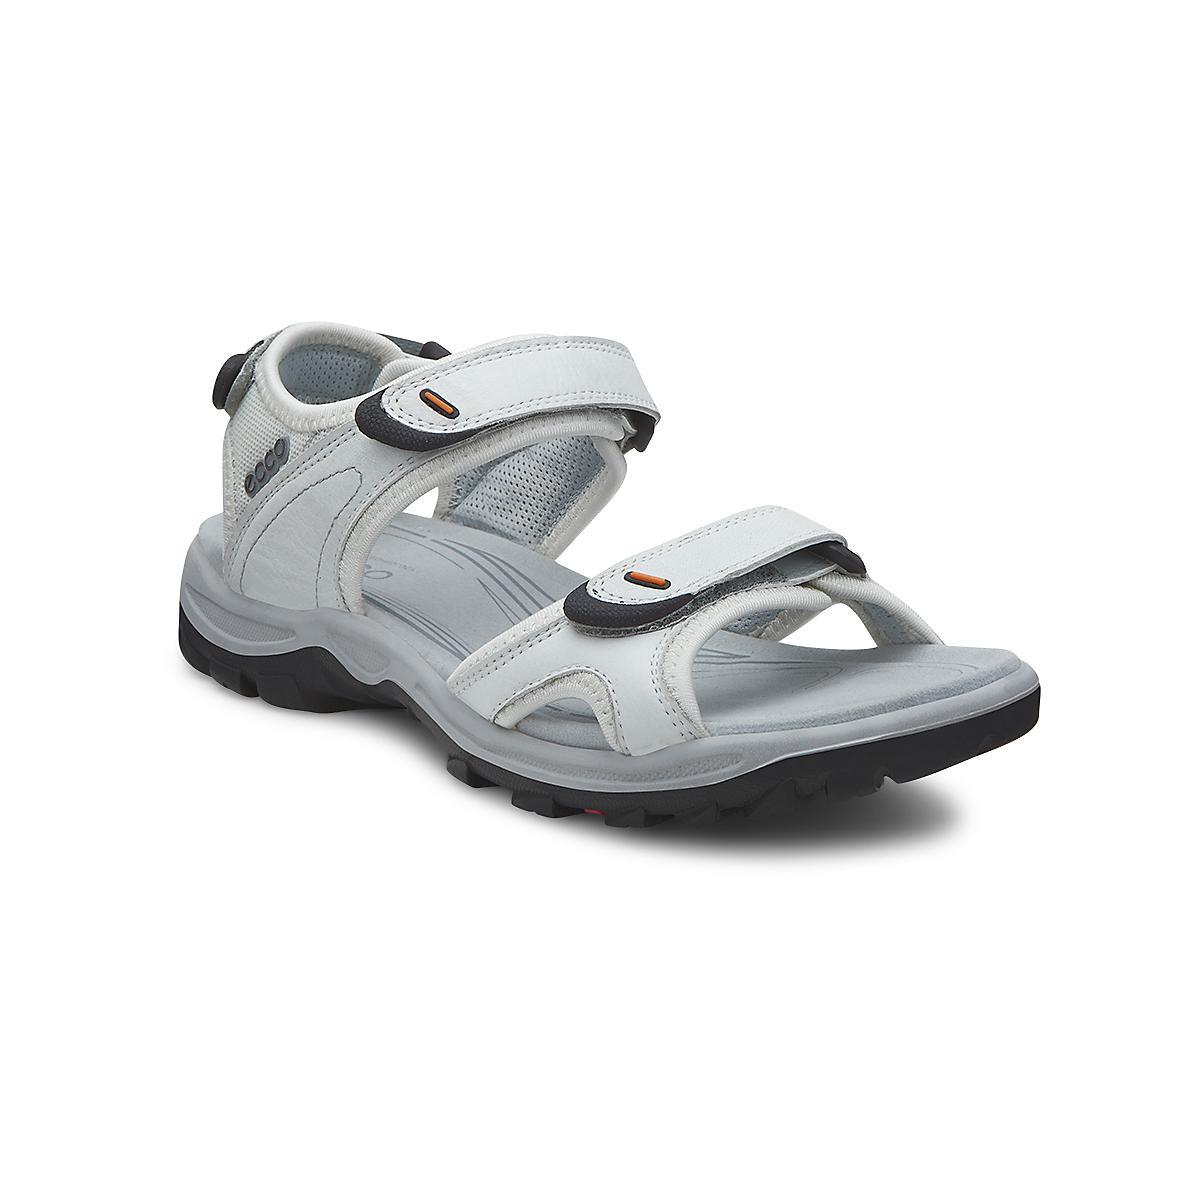 f404bfa91edd Womens Ecco Offroad Lite Sandals Shoe at Road Runner Sports